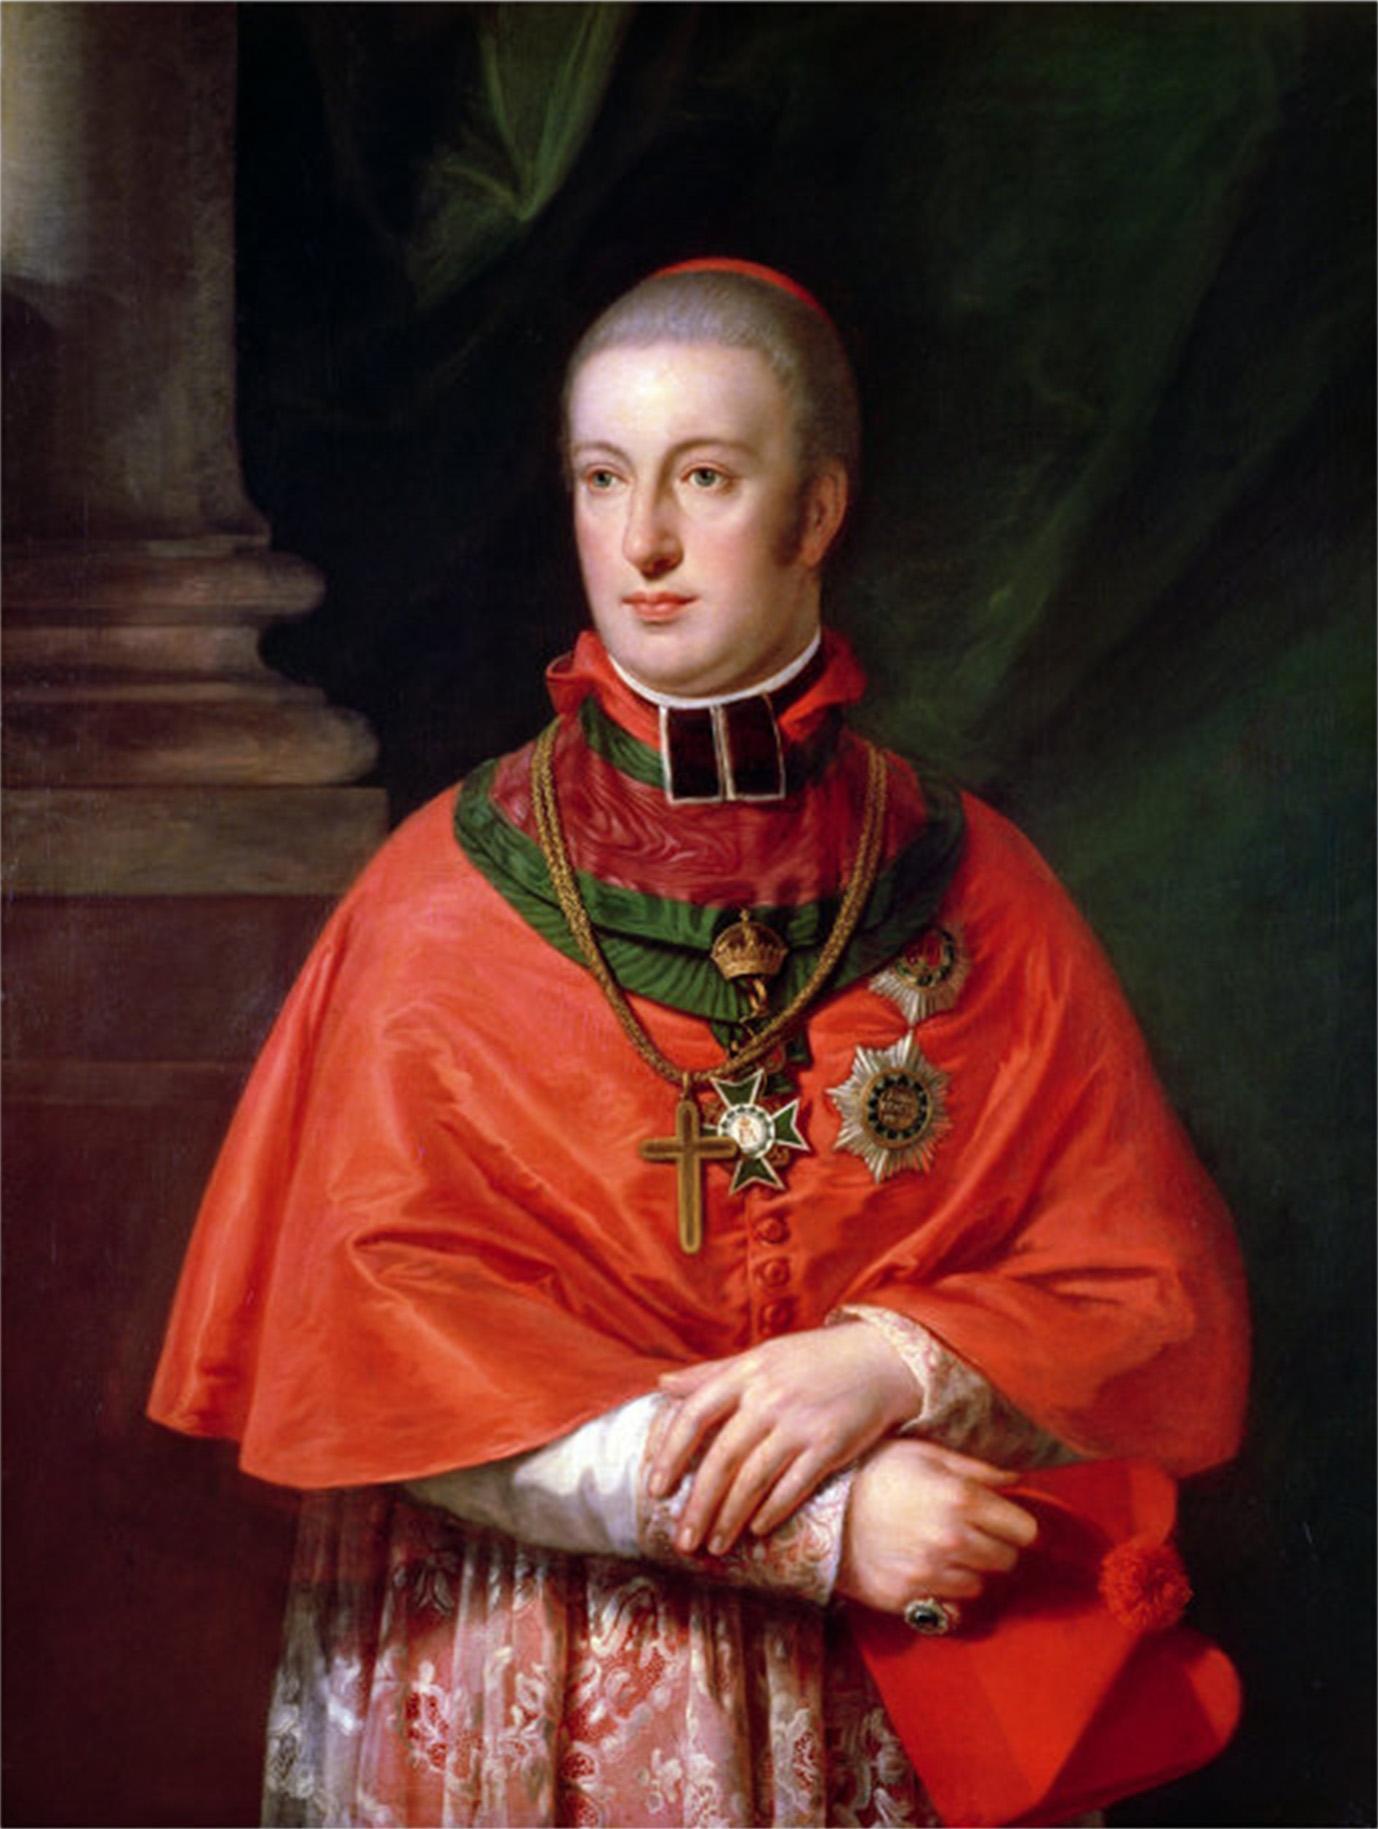 El archiduque Johann Joseph Rainer Rudolph, benefactor de Beethoven.